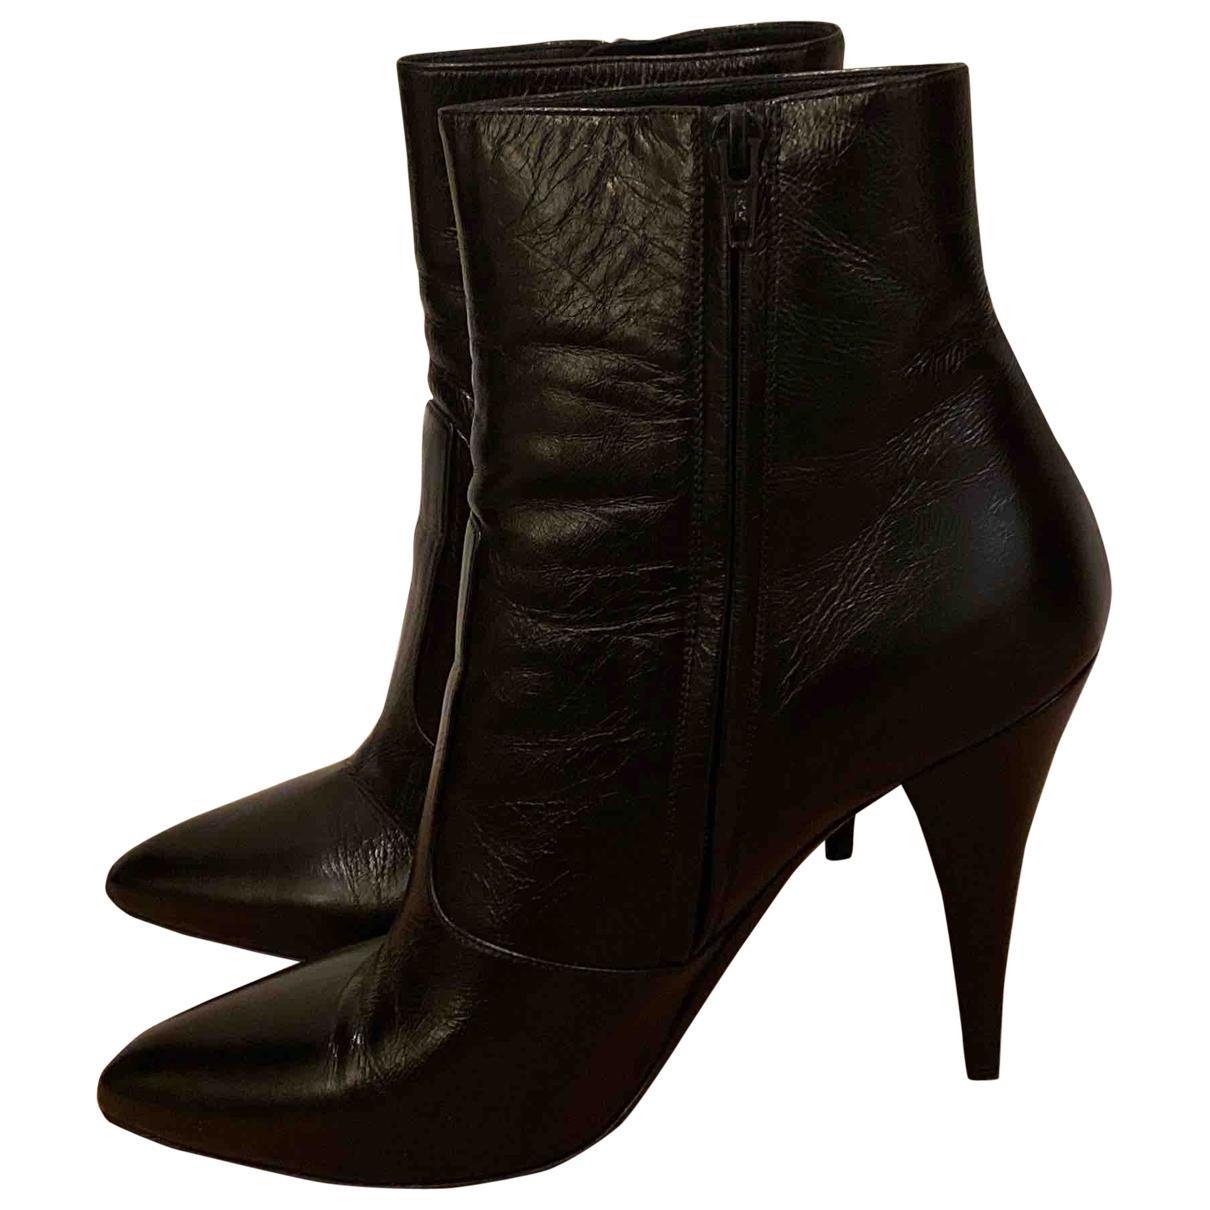 Saint Laurent \N Black Patent leather Ankle boots for Women 41 EU